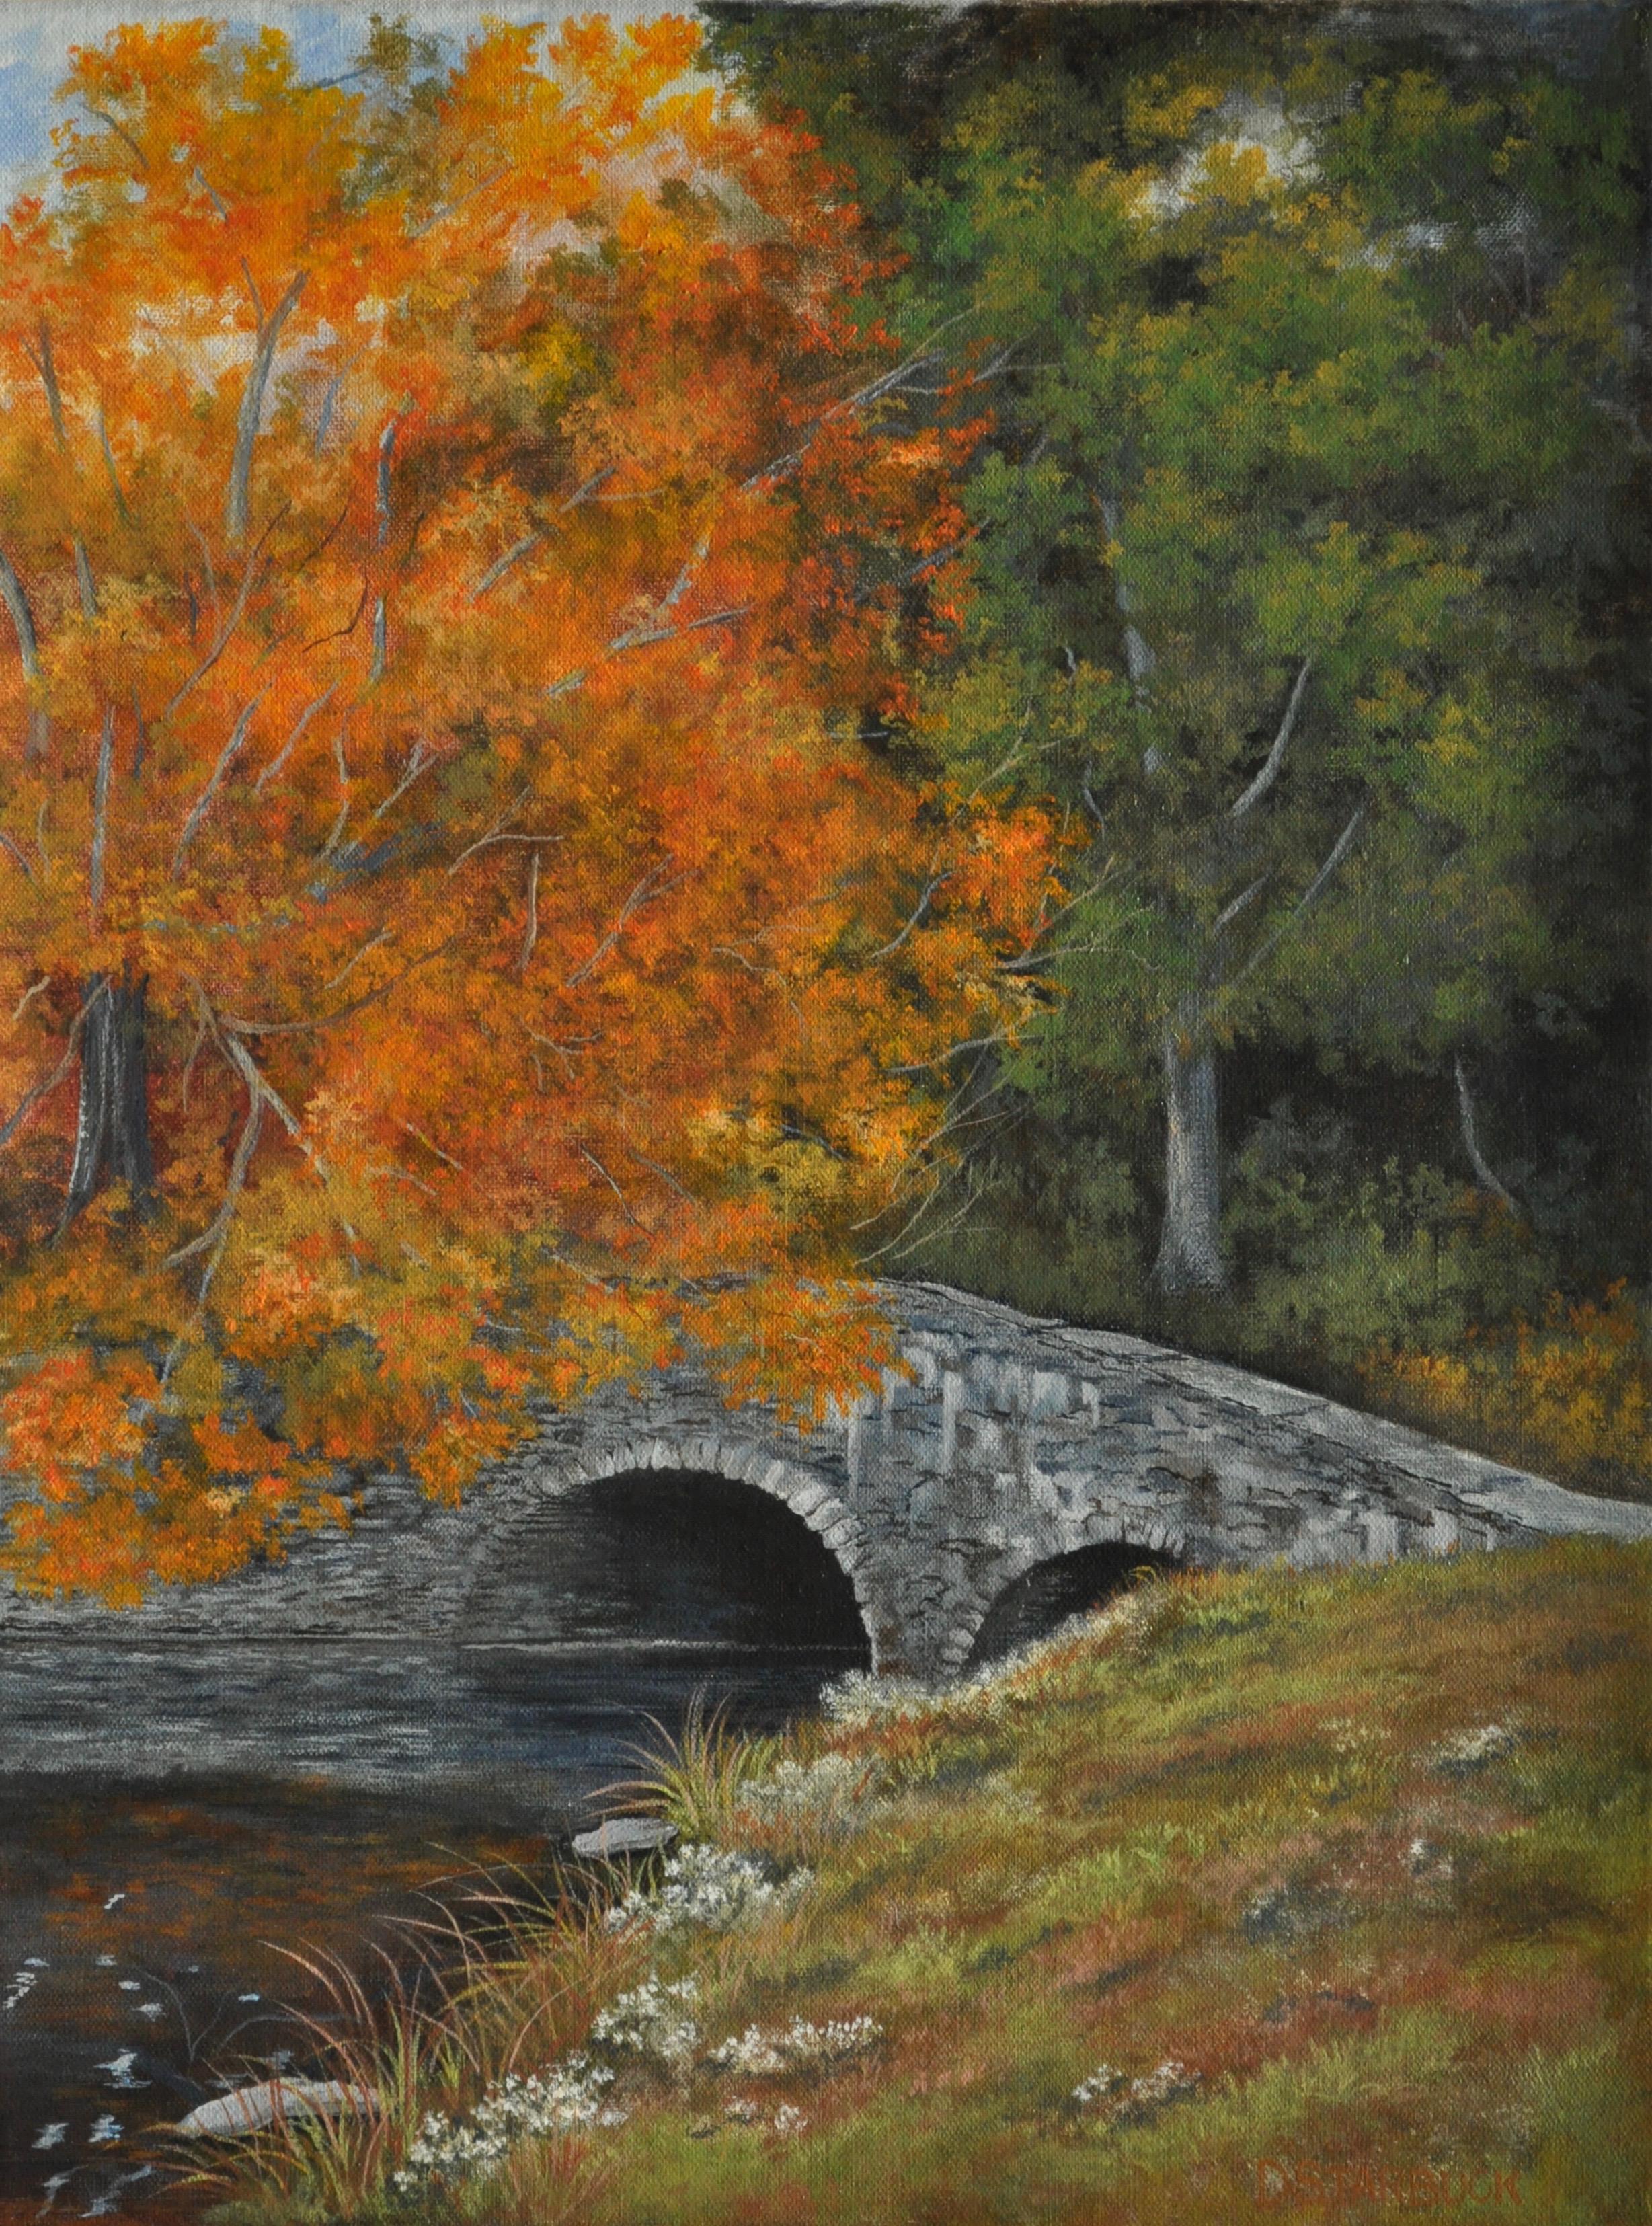 """Morning Crossing @ Bass Lake"" Blue Ridge Parkway, NC  Original: 12"" x 16"""